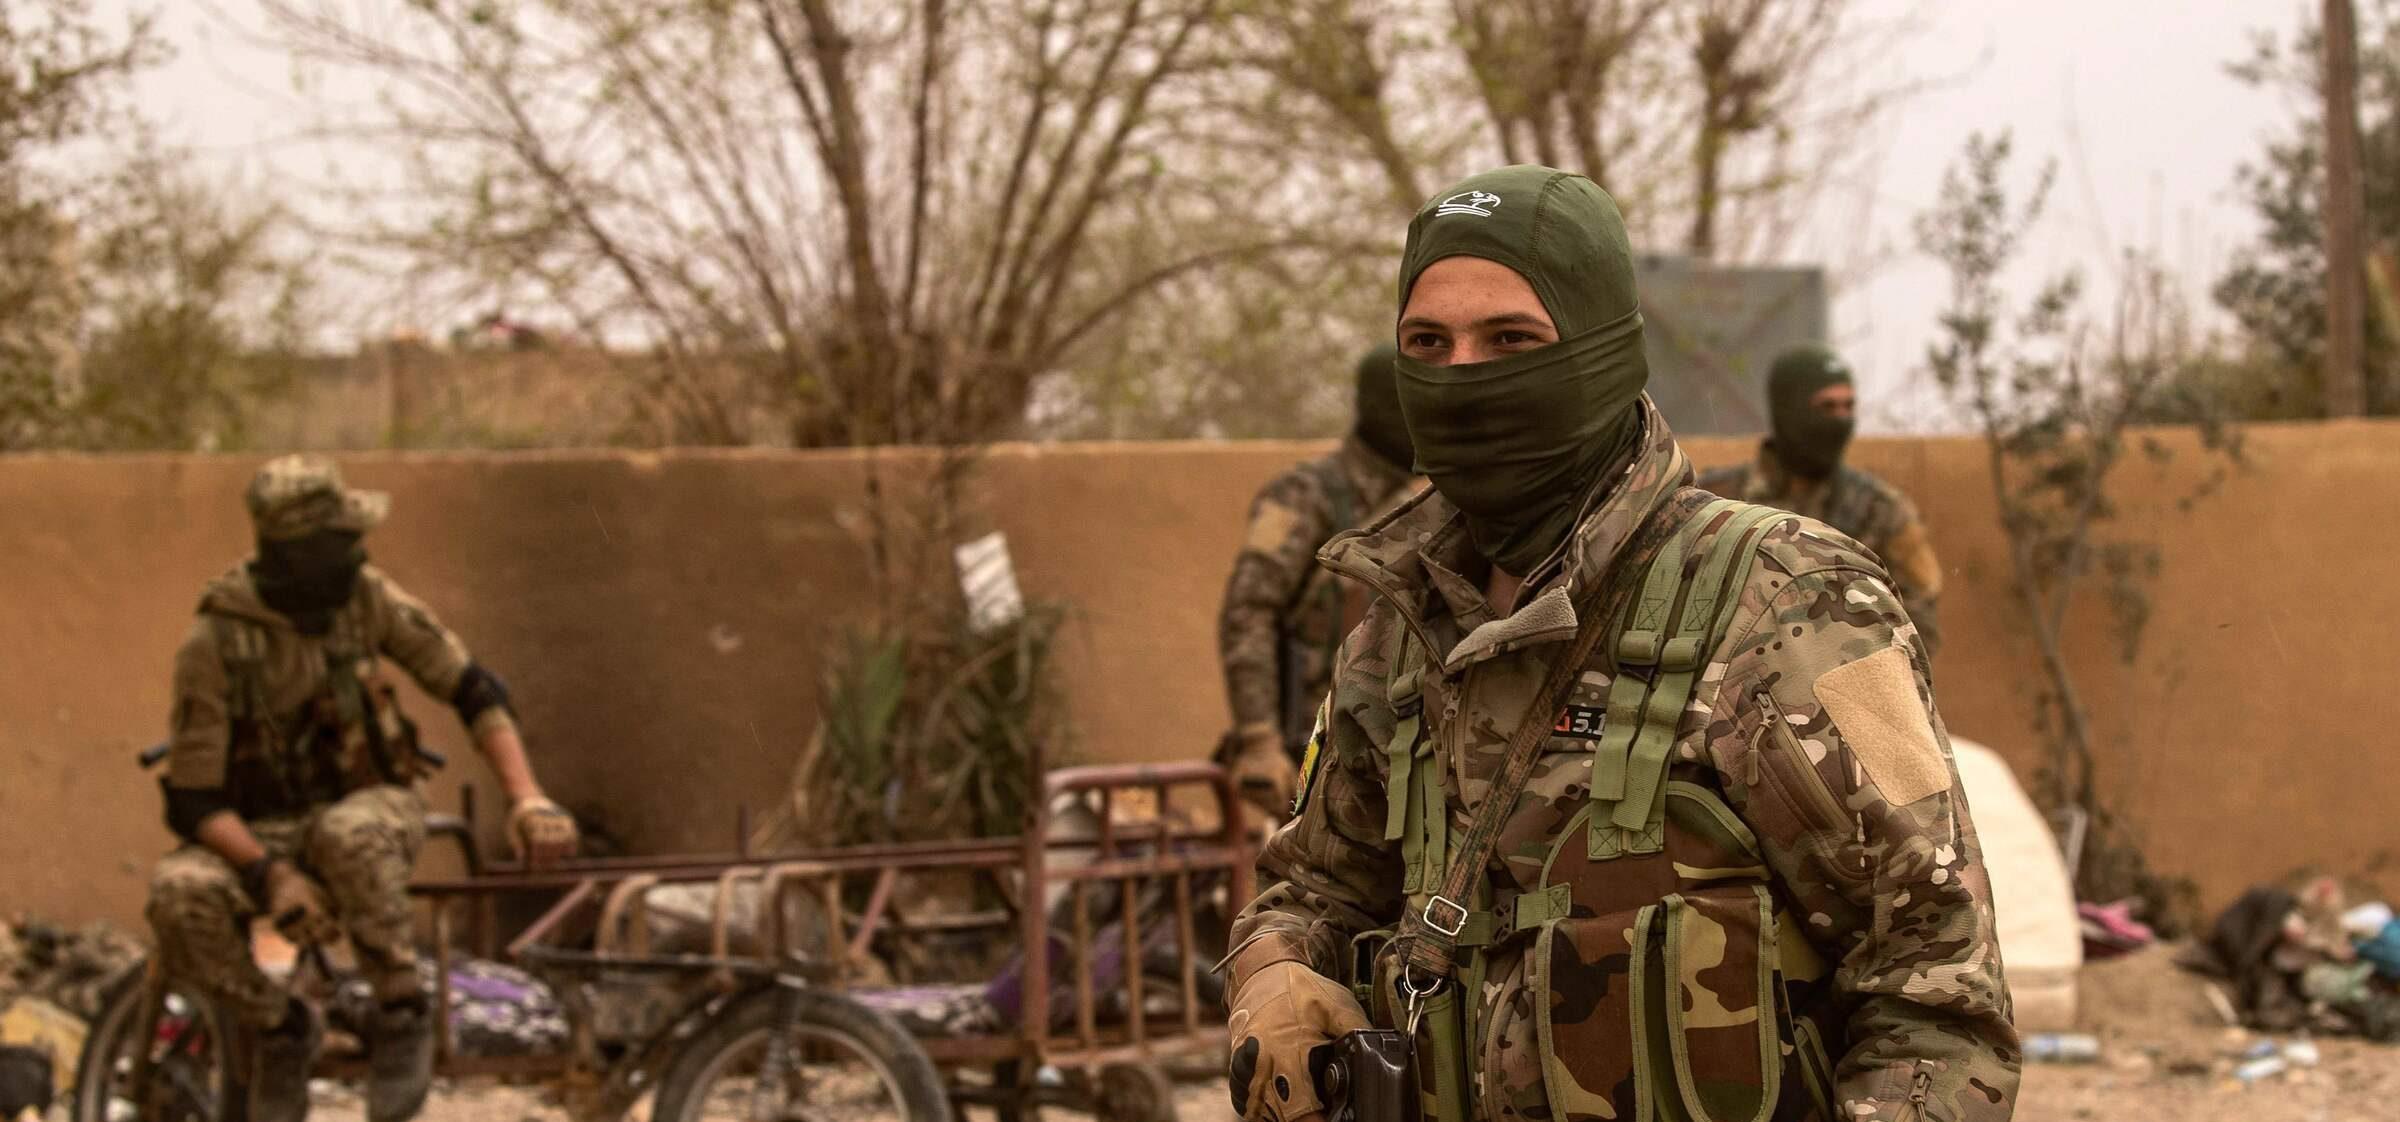 incontri curdi online NY minuti di incontri Yelp